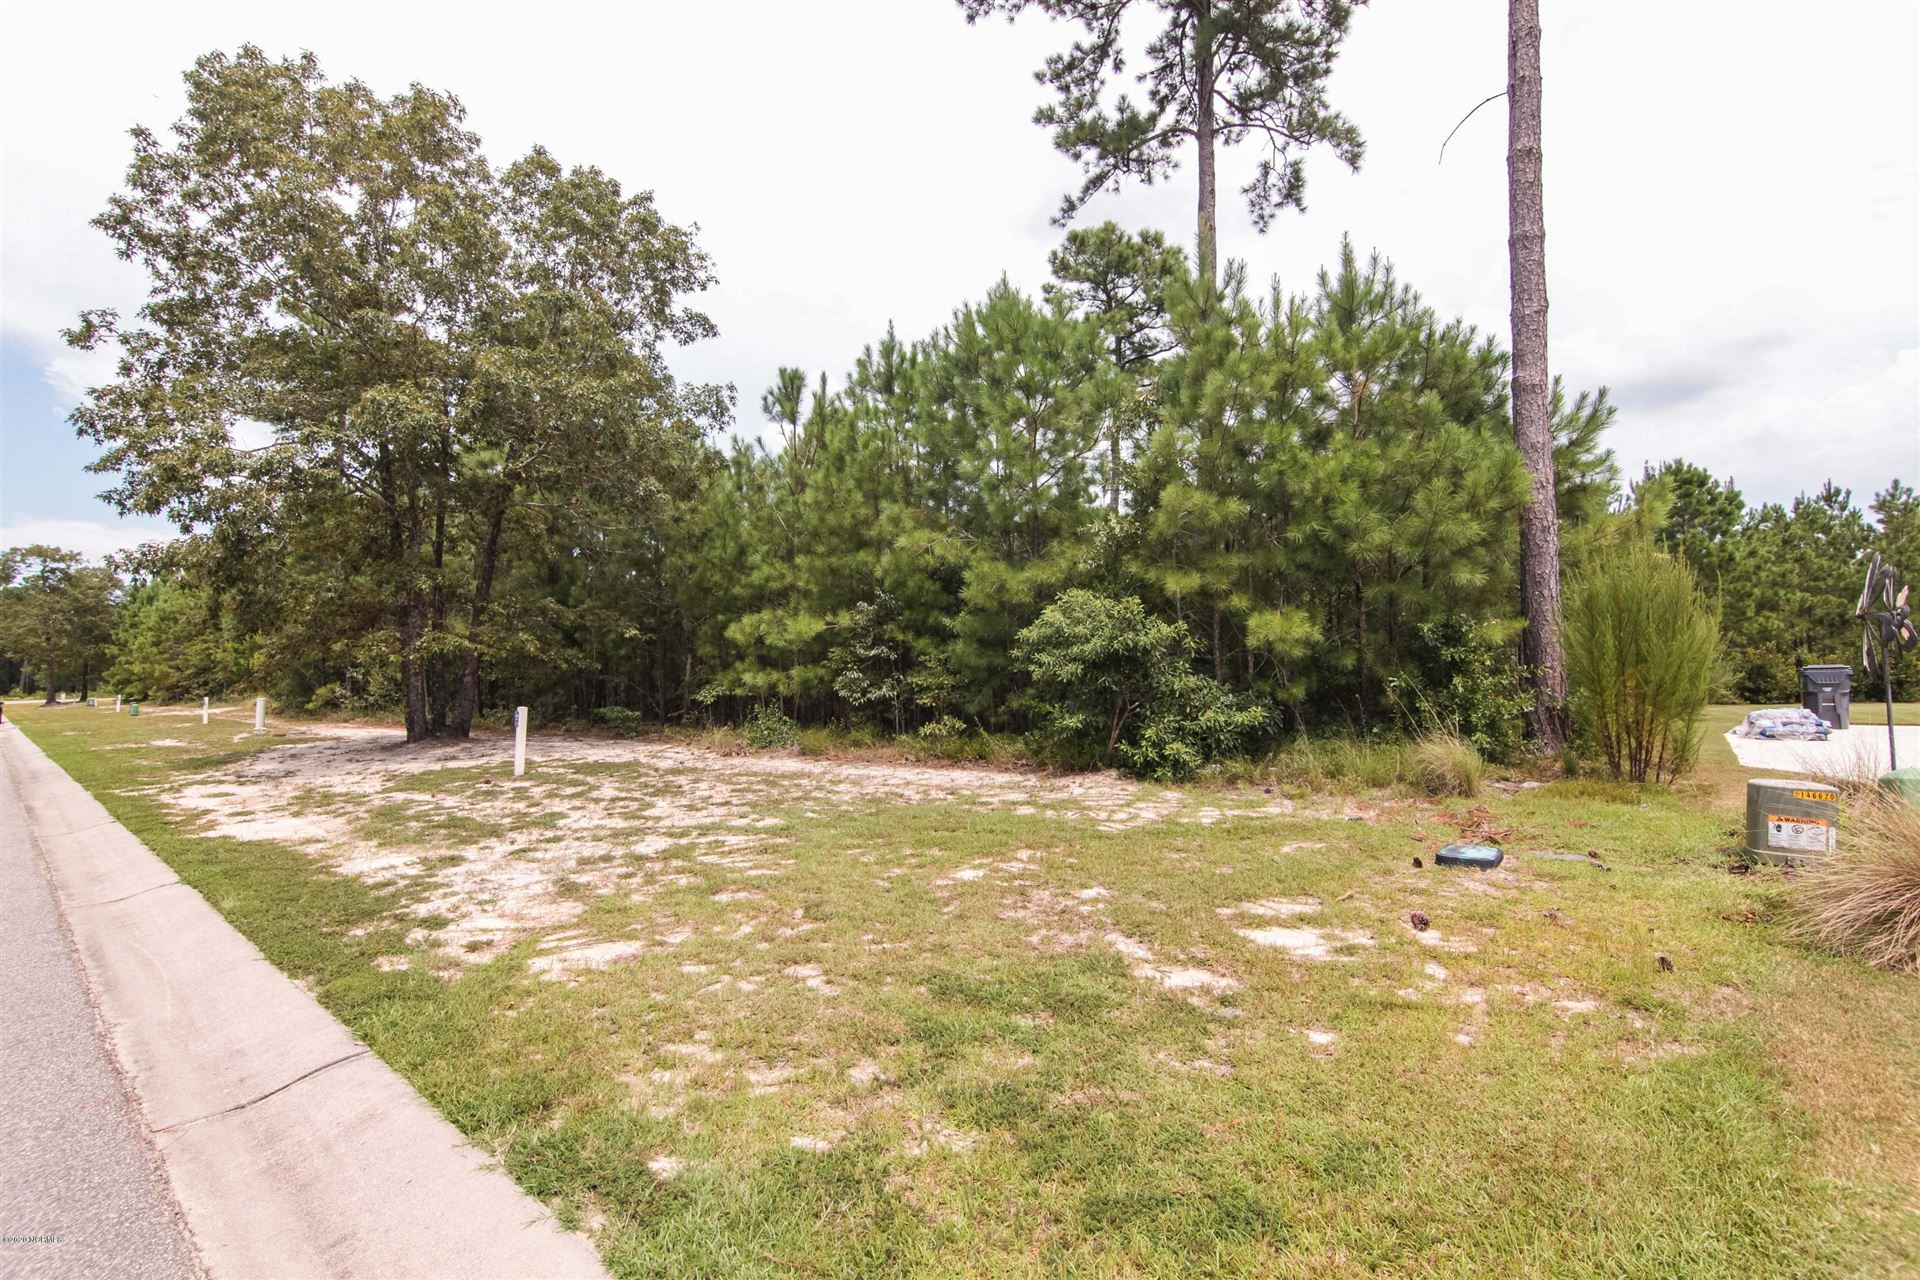 Photo of 3817 Silver Melon Road NE, Leland, NC 28451 (MLS # 100232364)